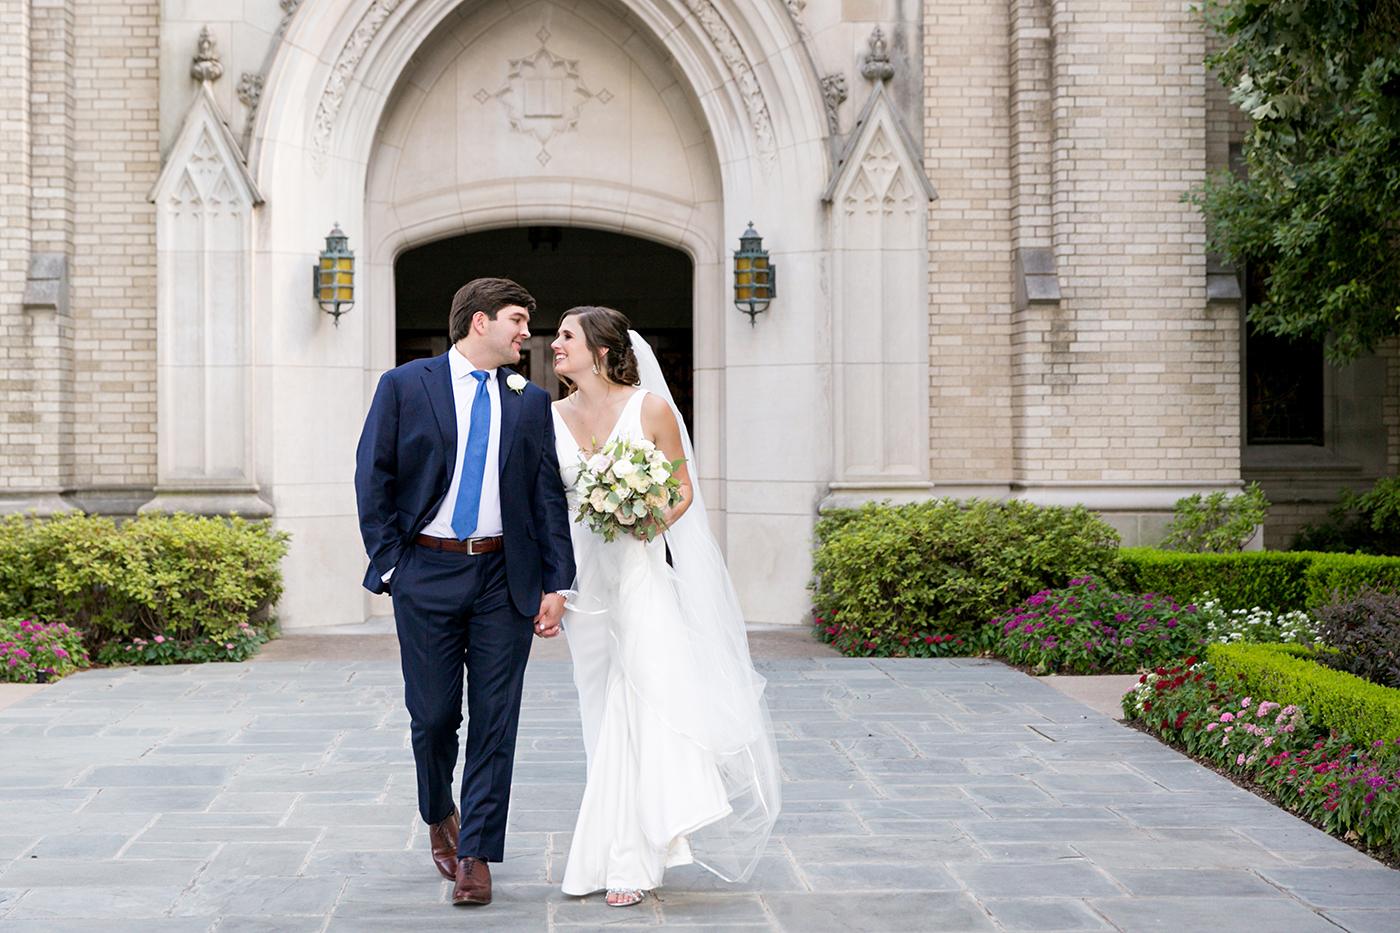 Wedding Planner Dallas TX - Allday Events - Highland Park - Marie Gabrielle Wedding - 263.jpg